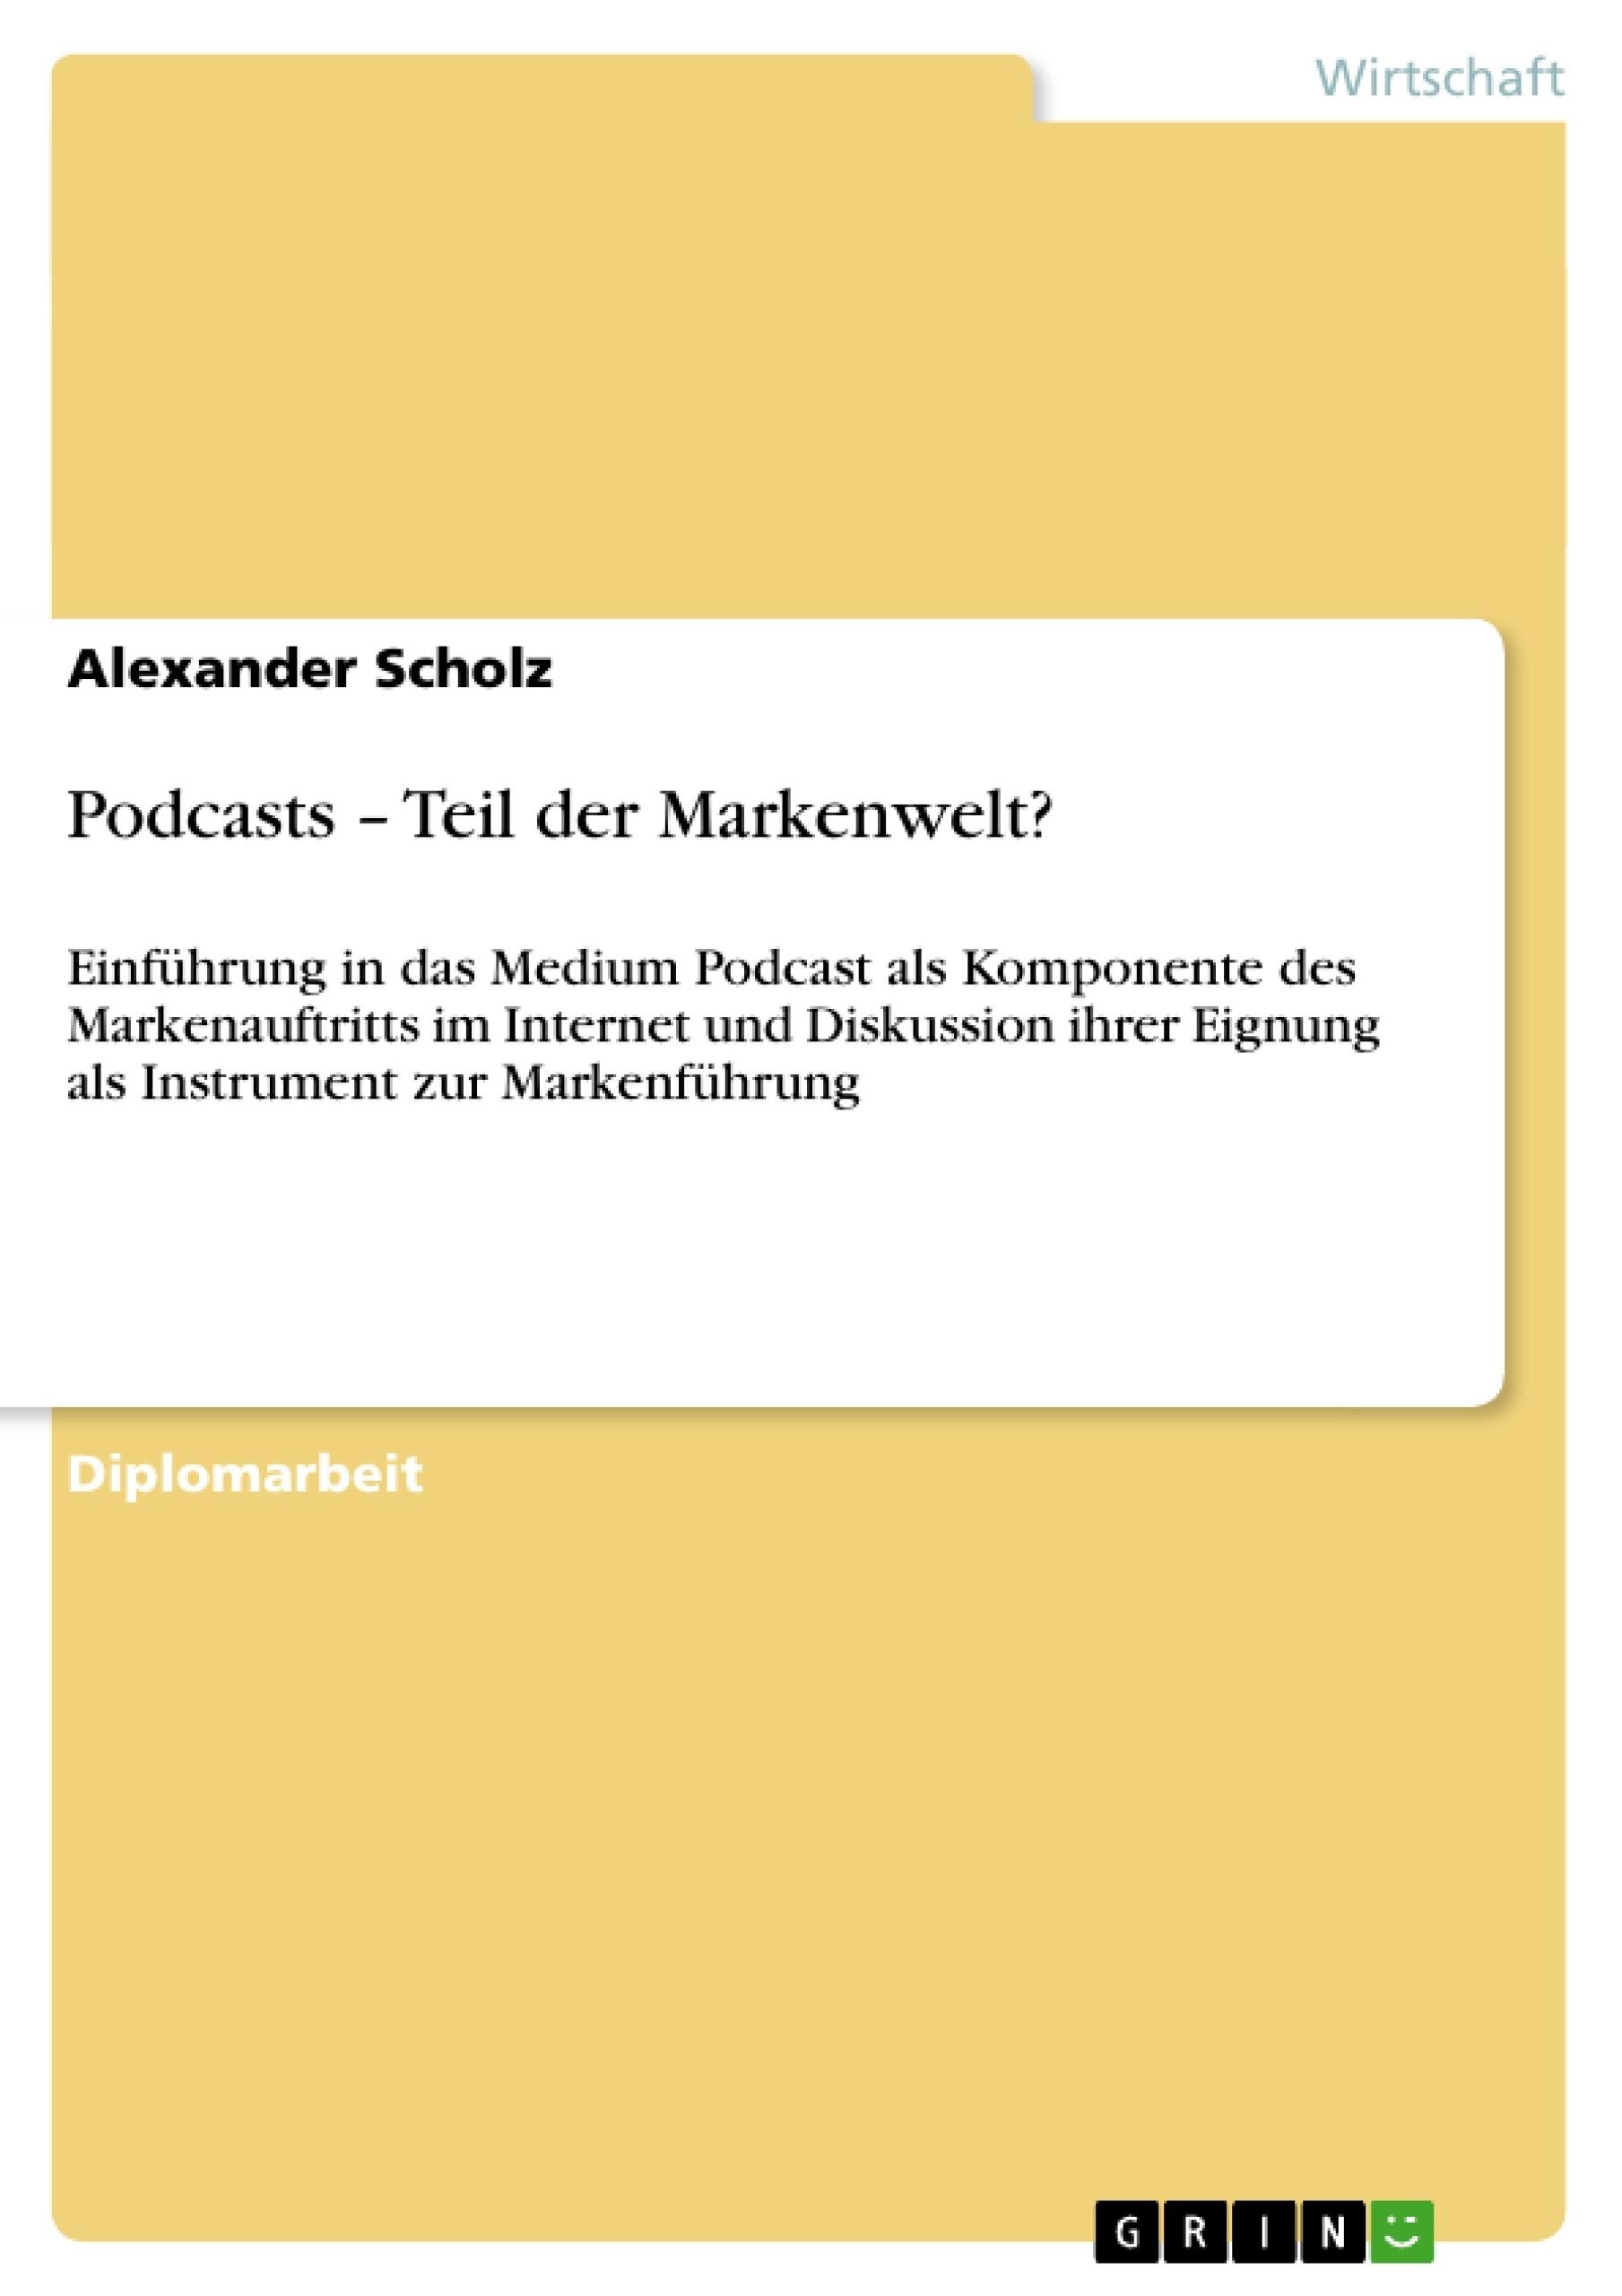 Titel: Podcasts – Teil der Markenwelt?